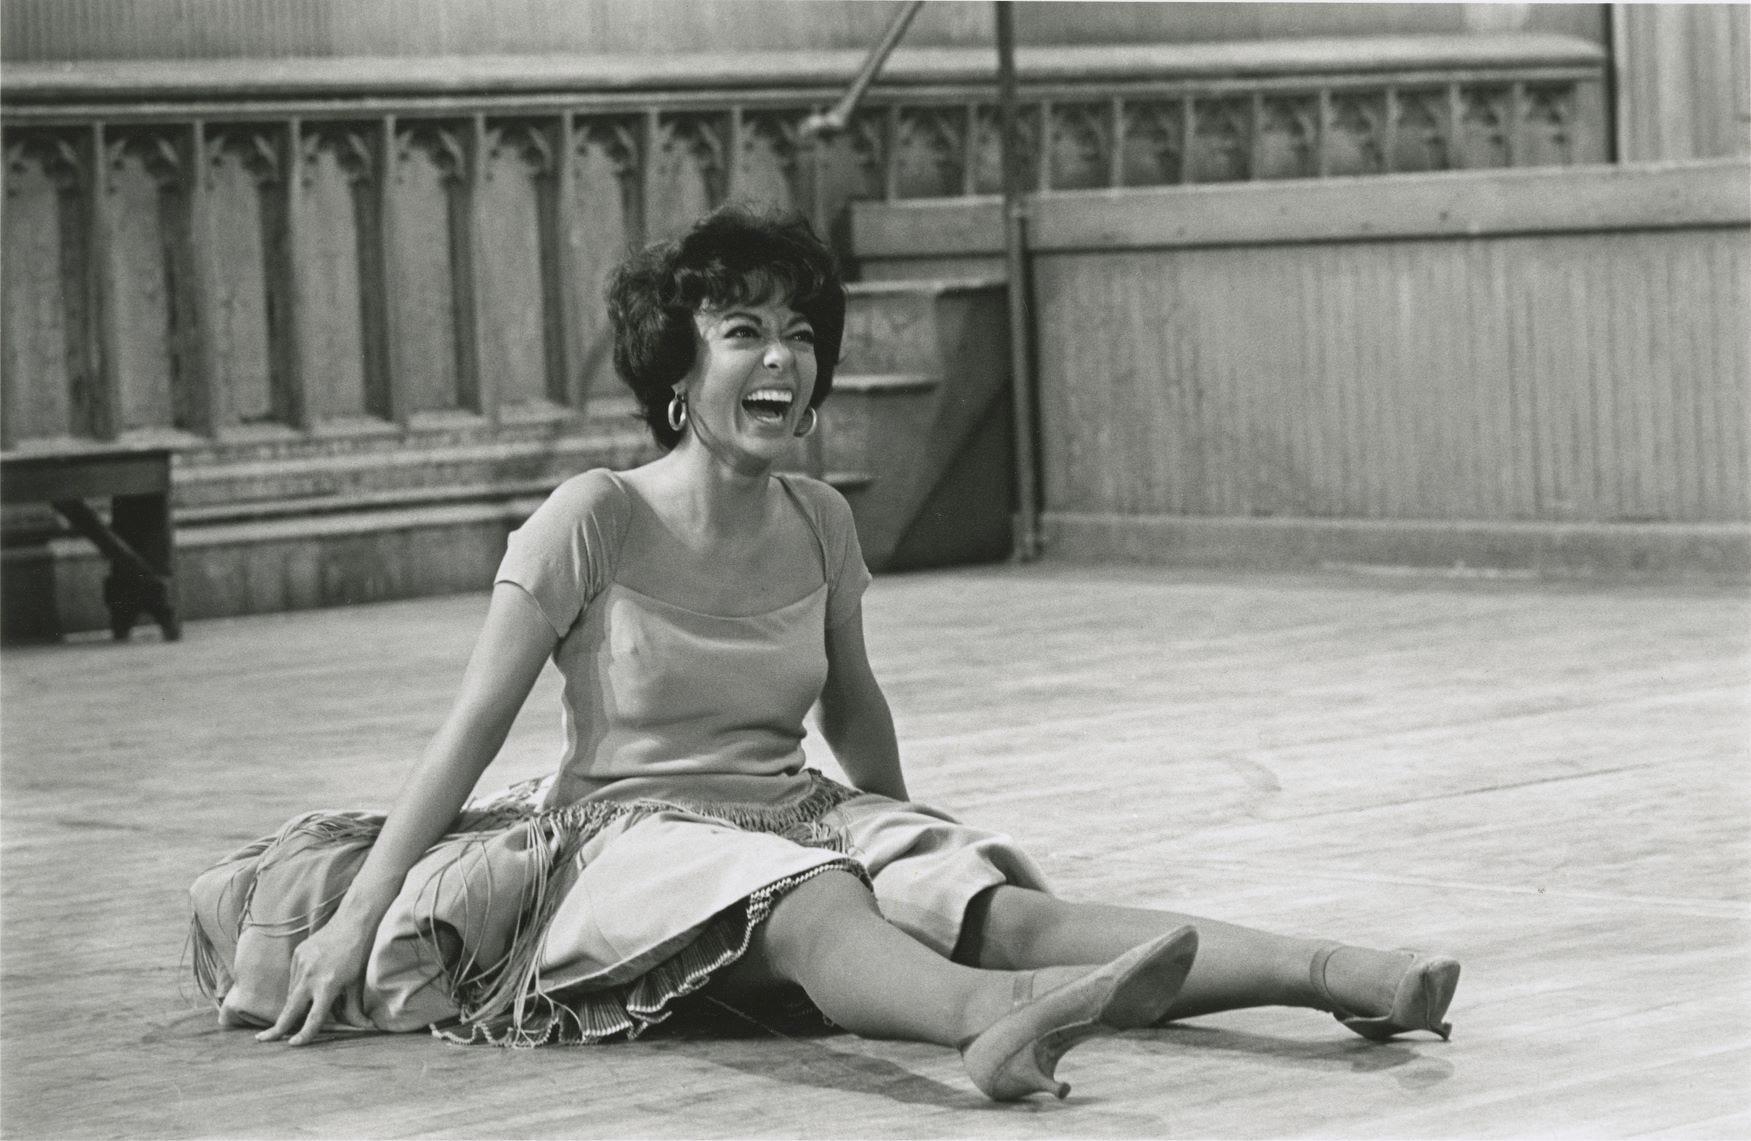 Rita Moreno pushed back against dark makeup in original 'West Side Story': 'I'm not that color'